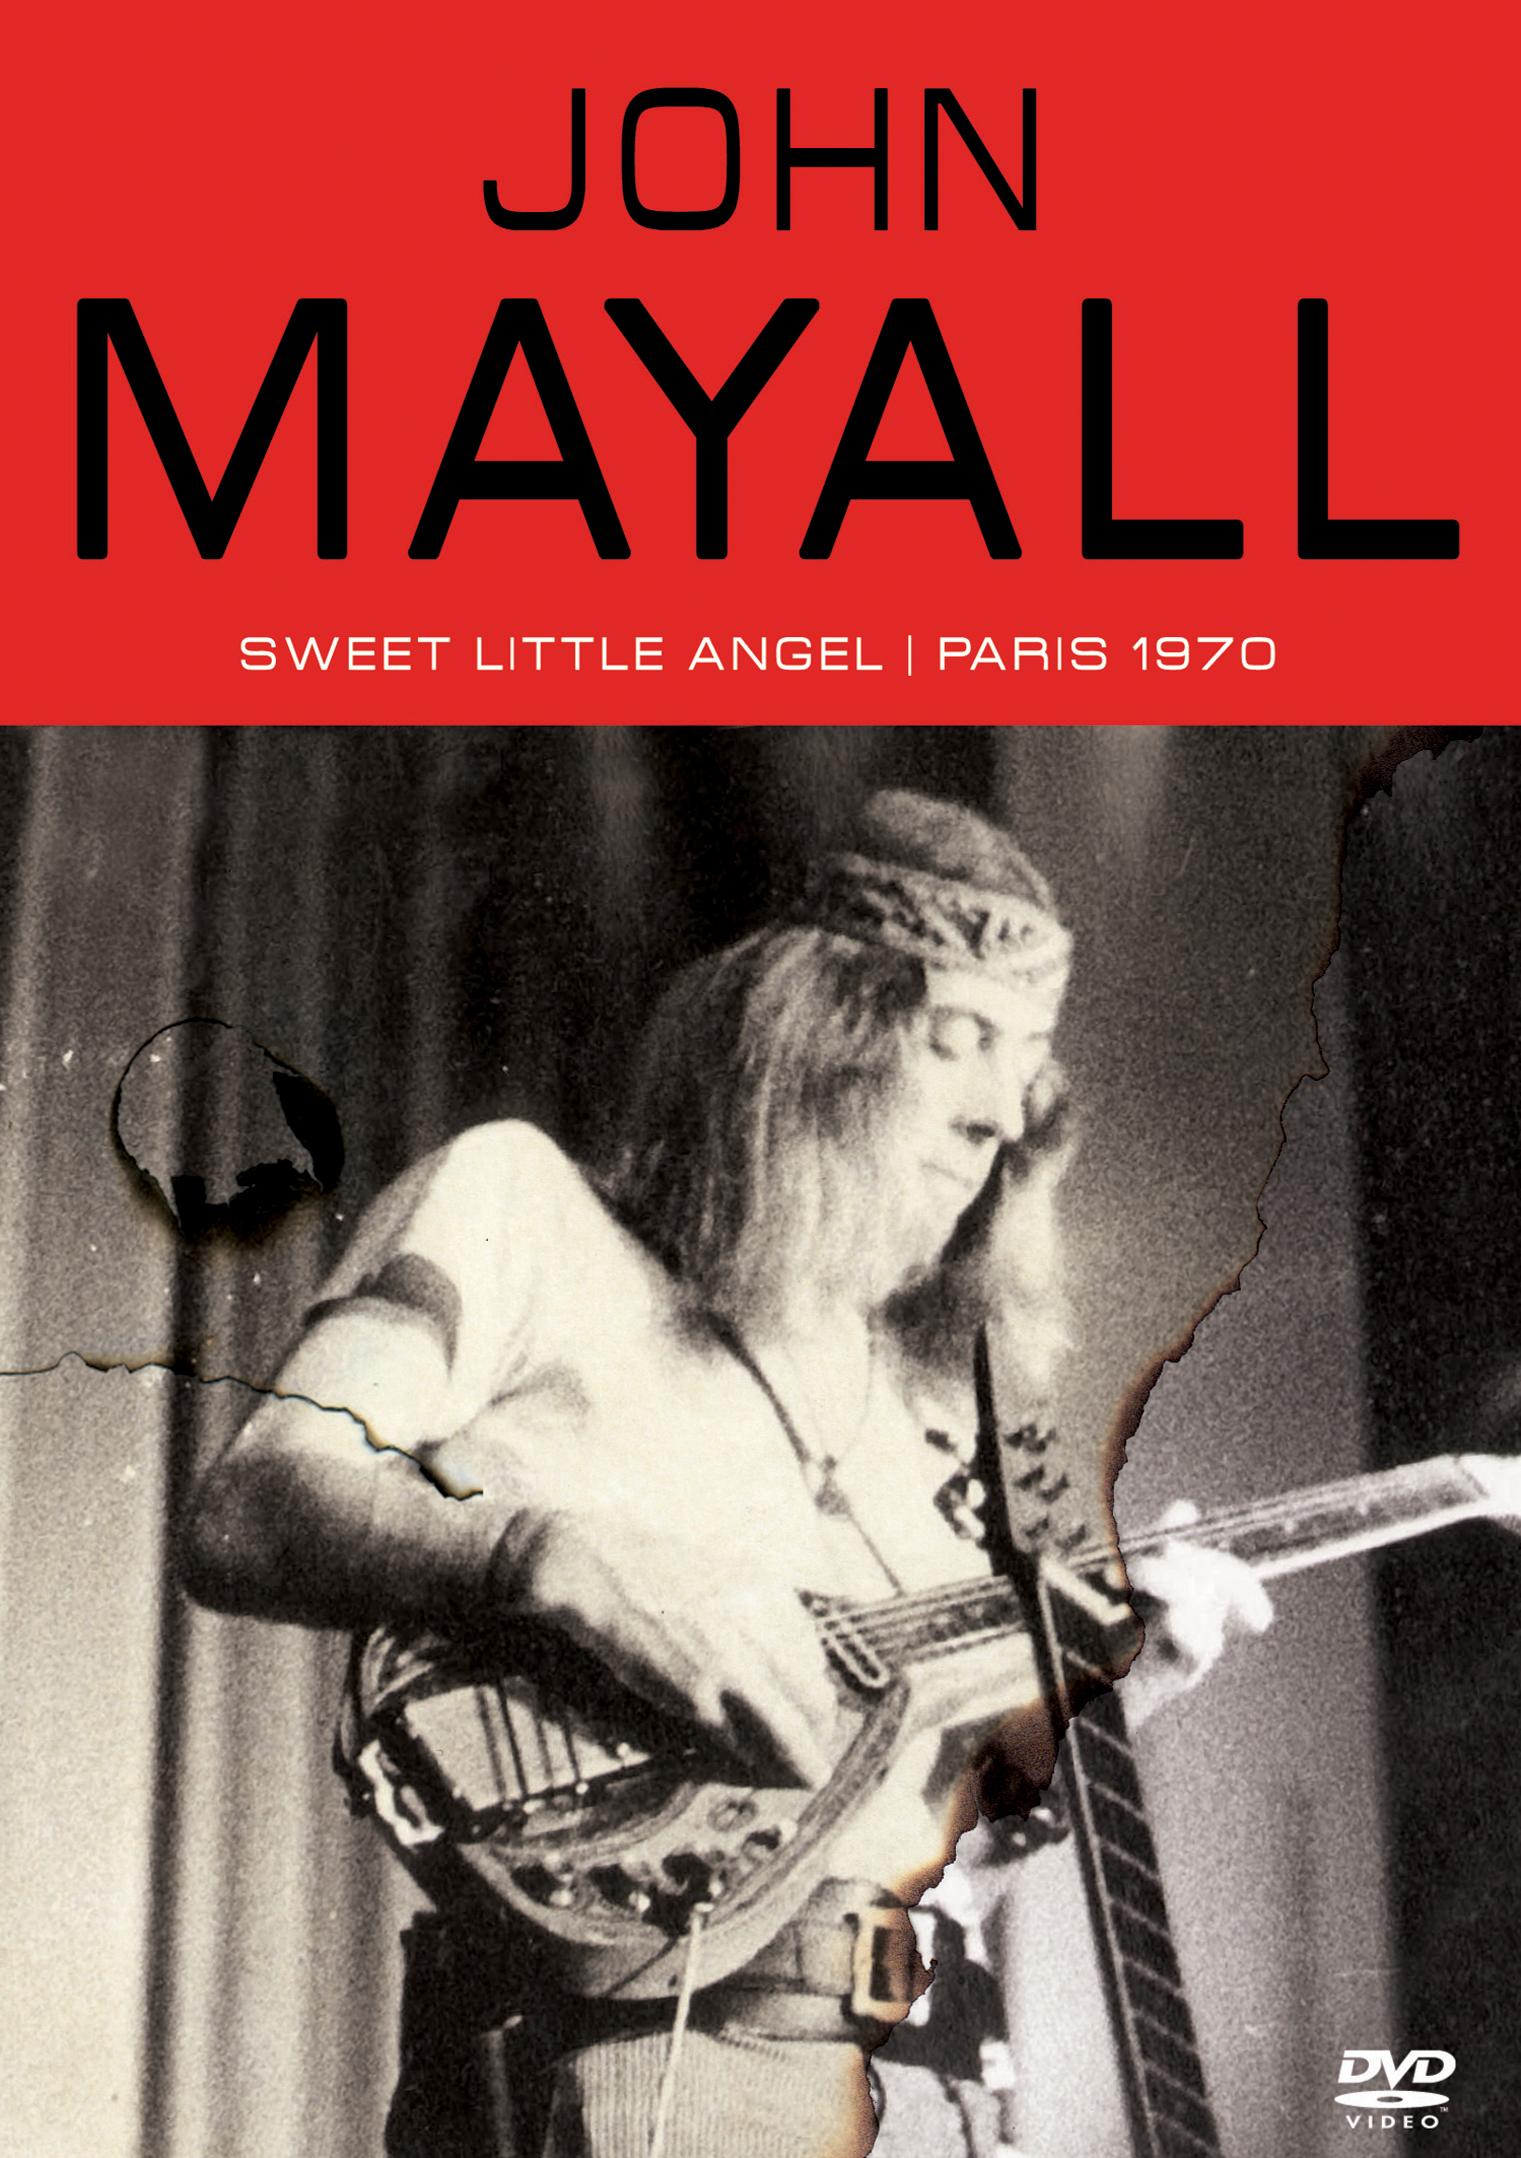 John Mayall: Sweet Little Angel - Paris 1970